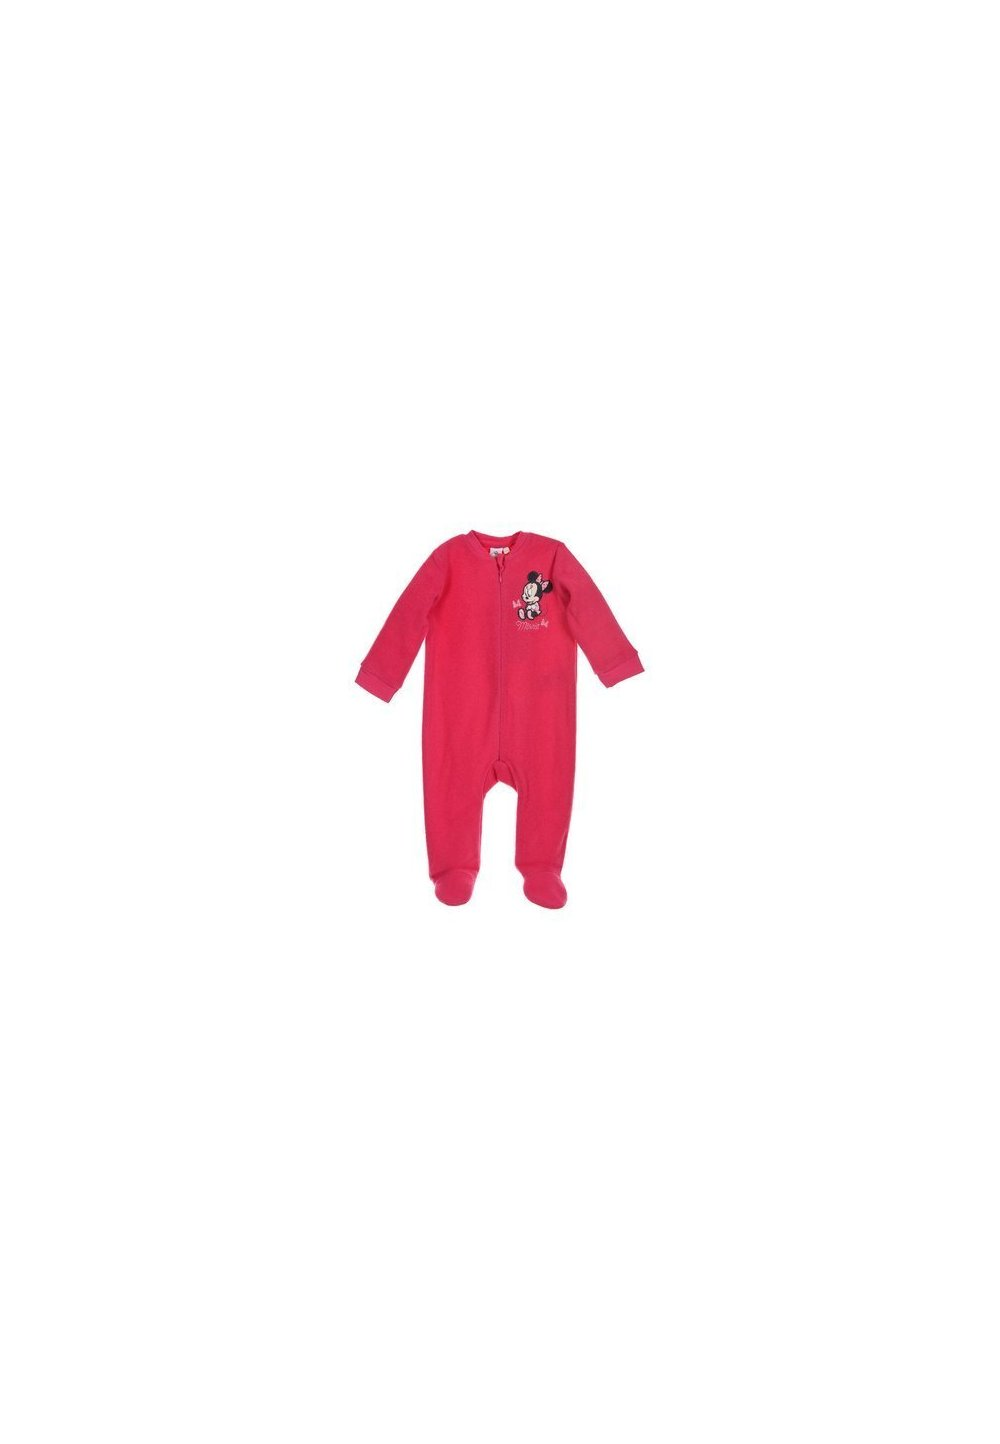 Salopeta fleece, roz inchis, Minnie imagine